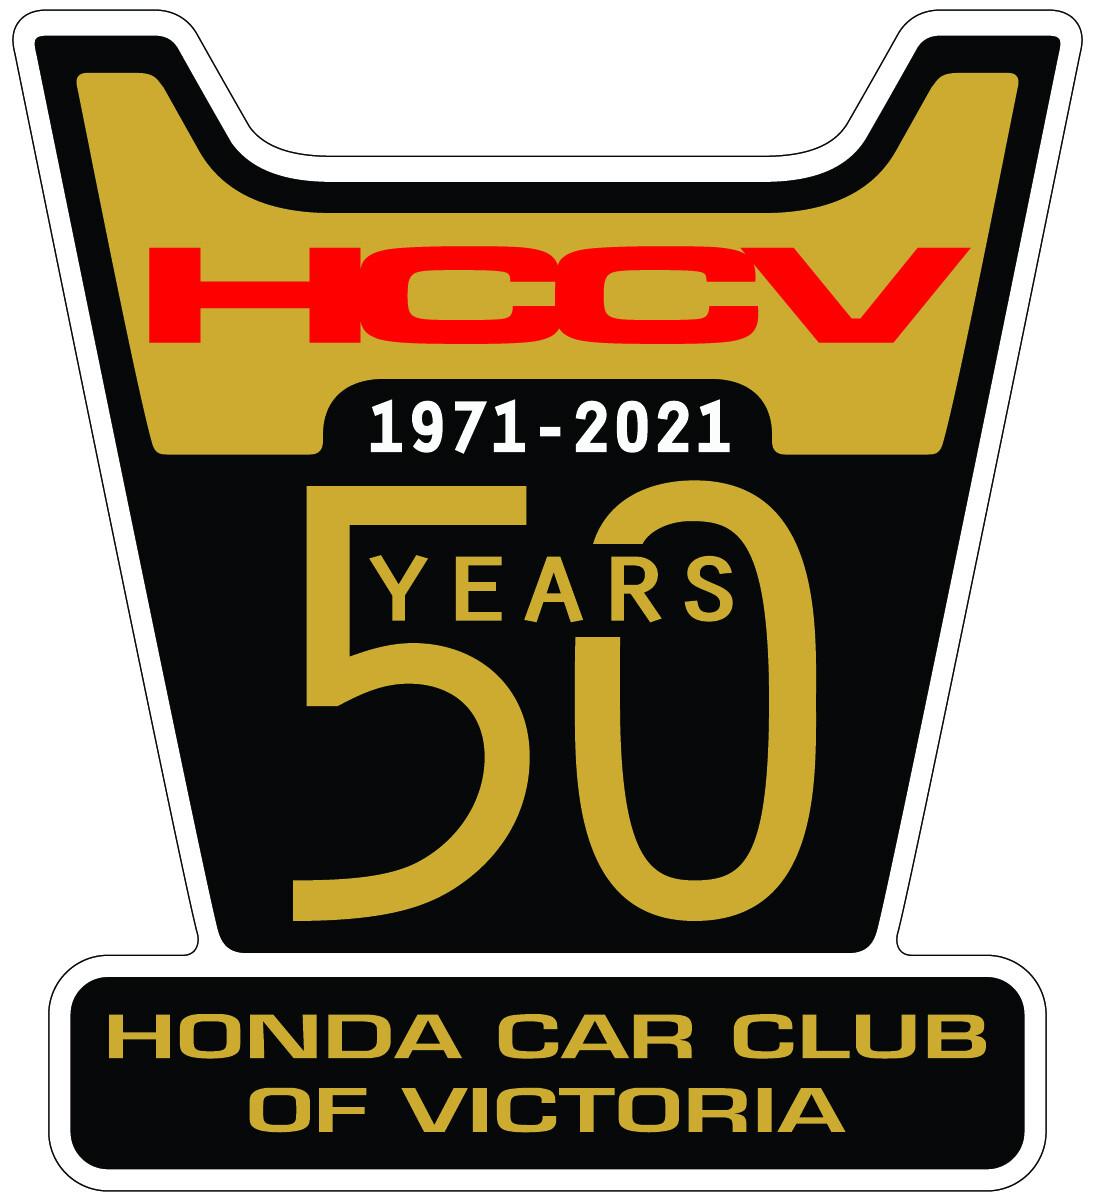 Honda Car Clubof Victoria 50 Yearslogo